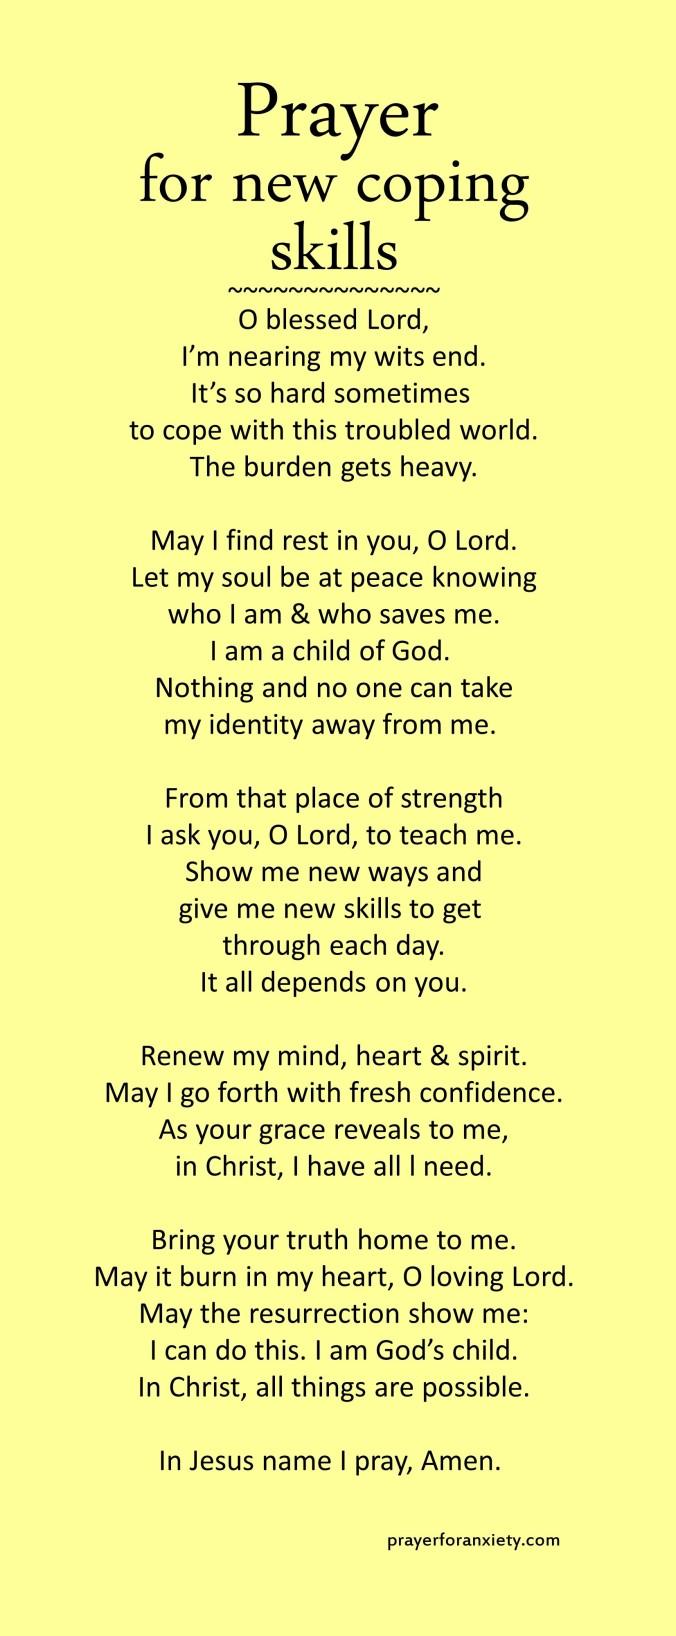 Prayer for new coping skills